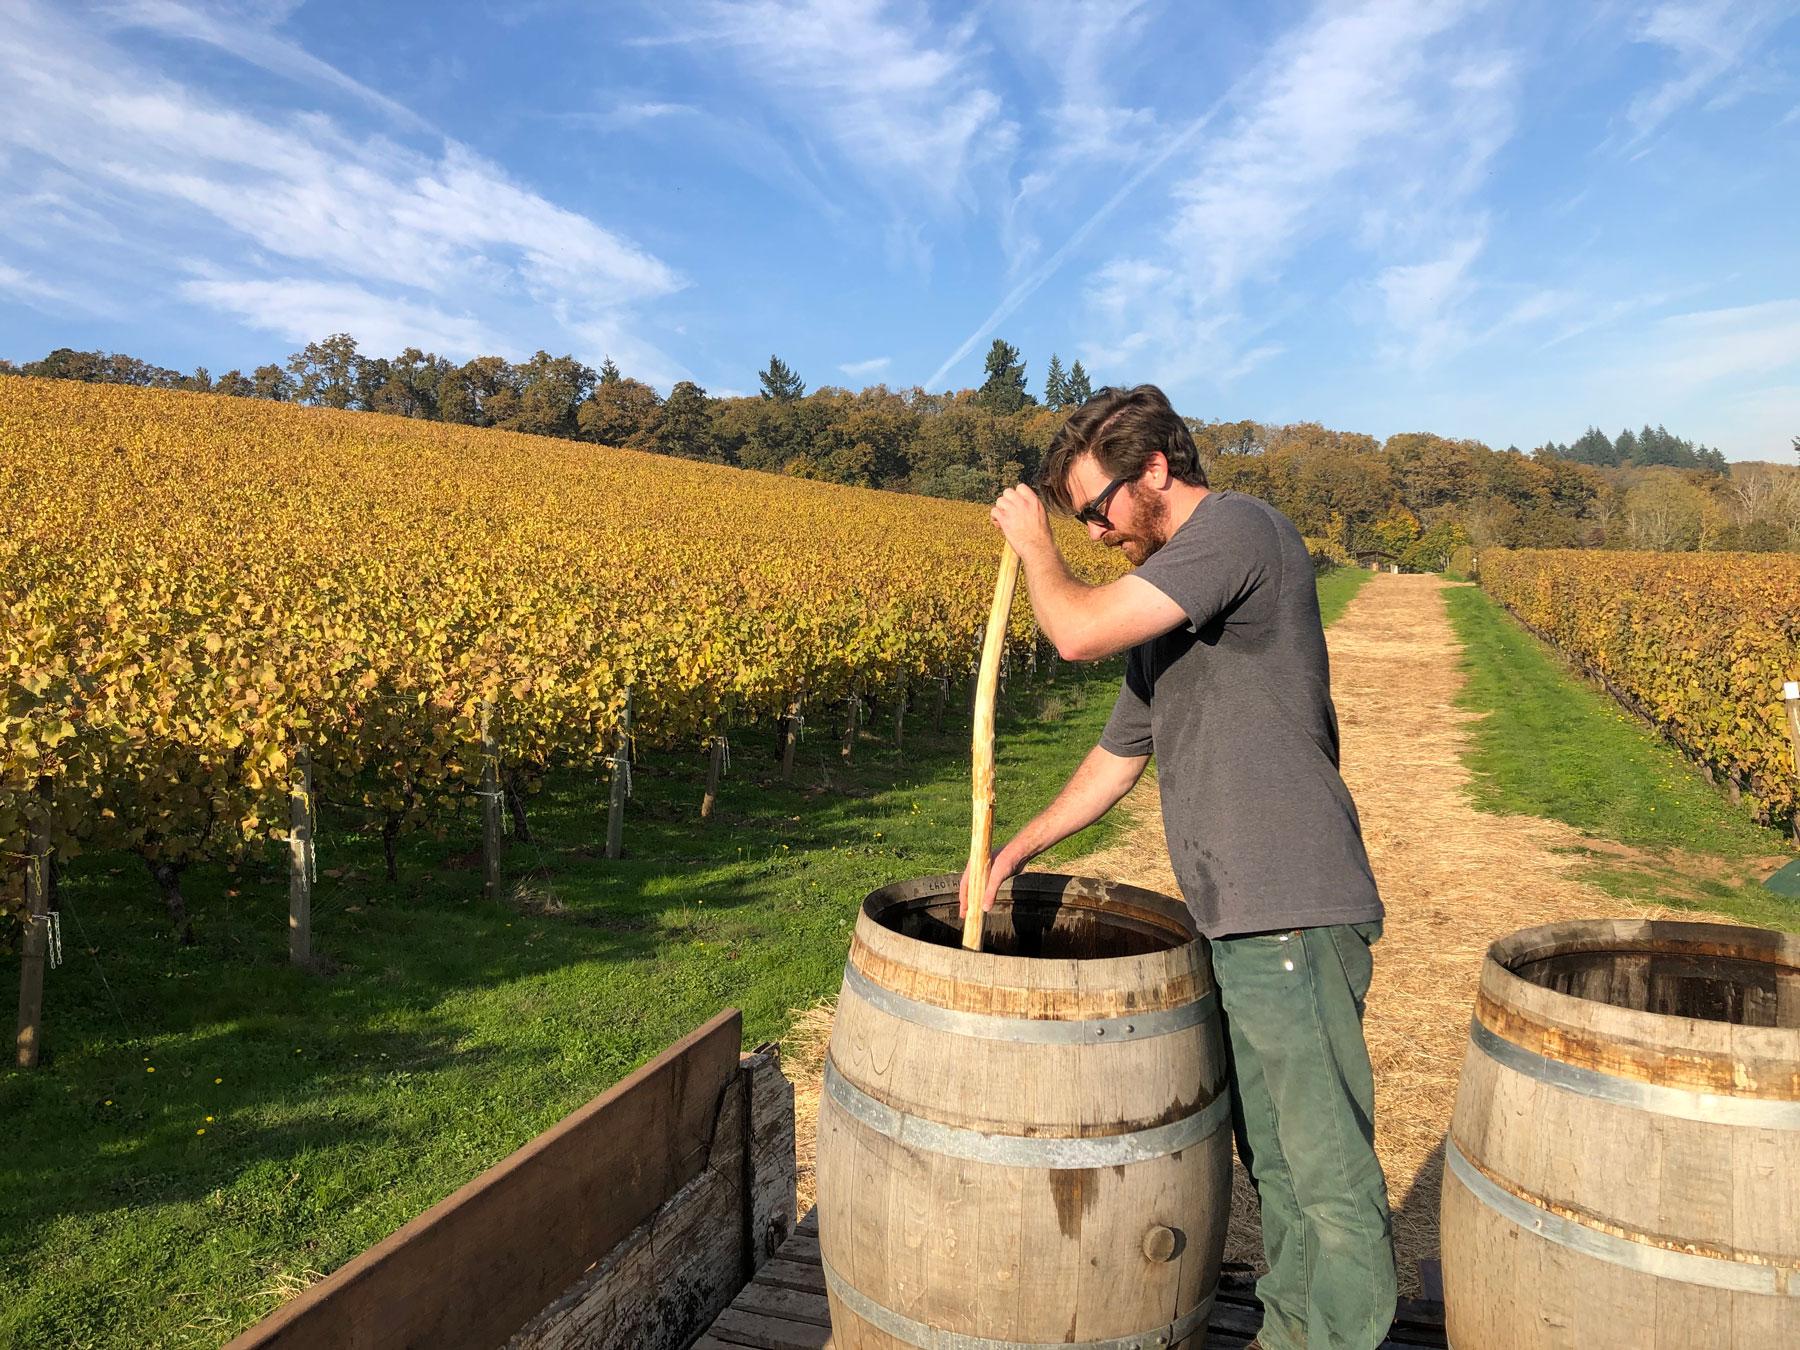 Mixing preparation in a barrel at Cristom Vineyards